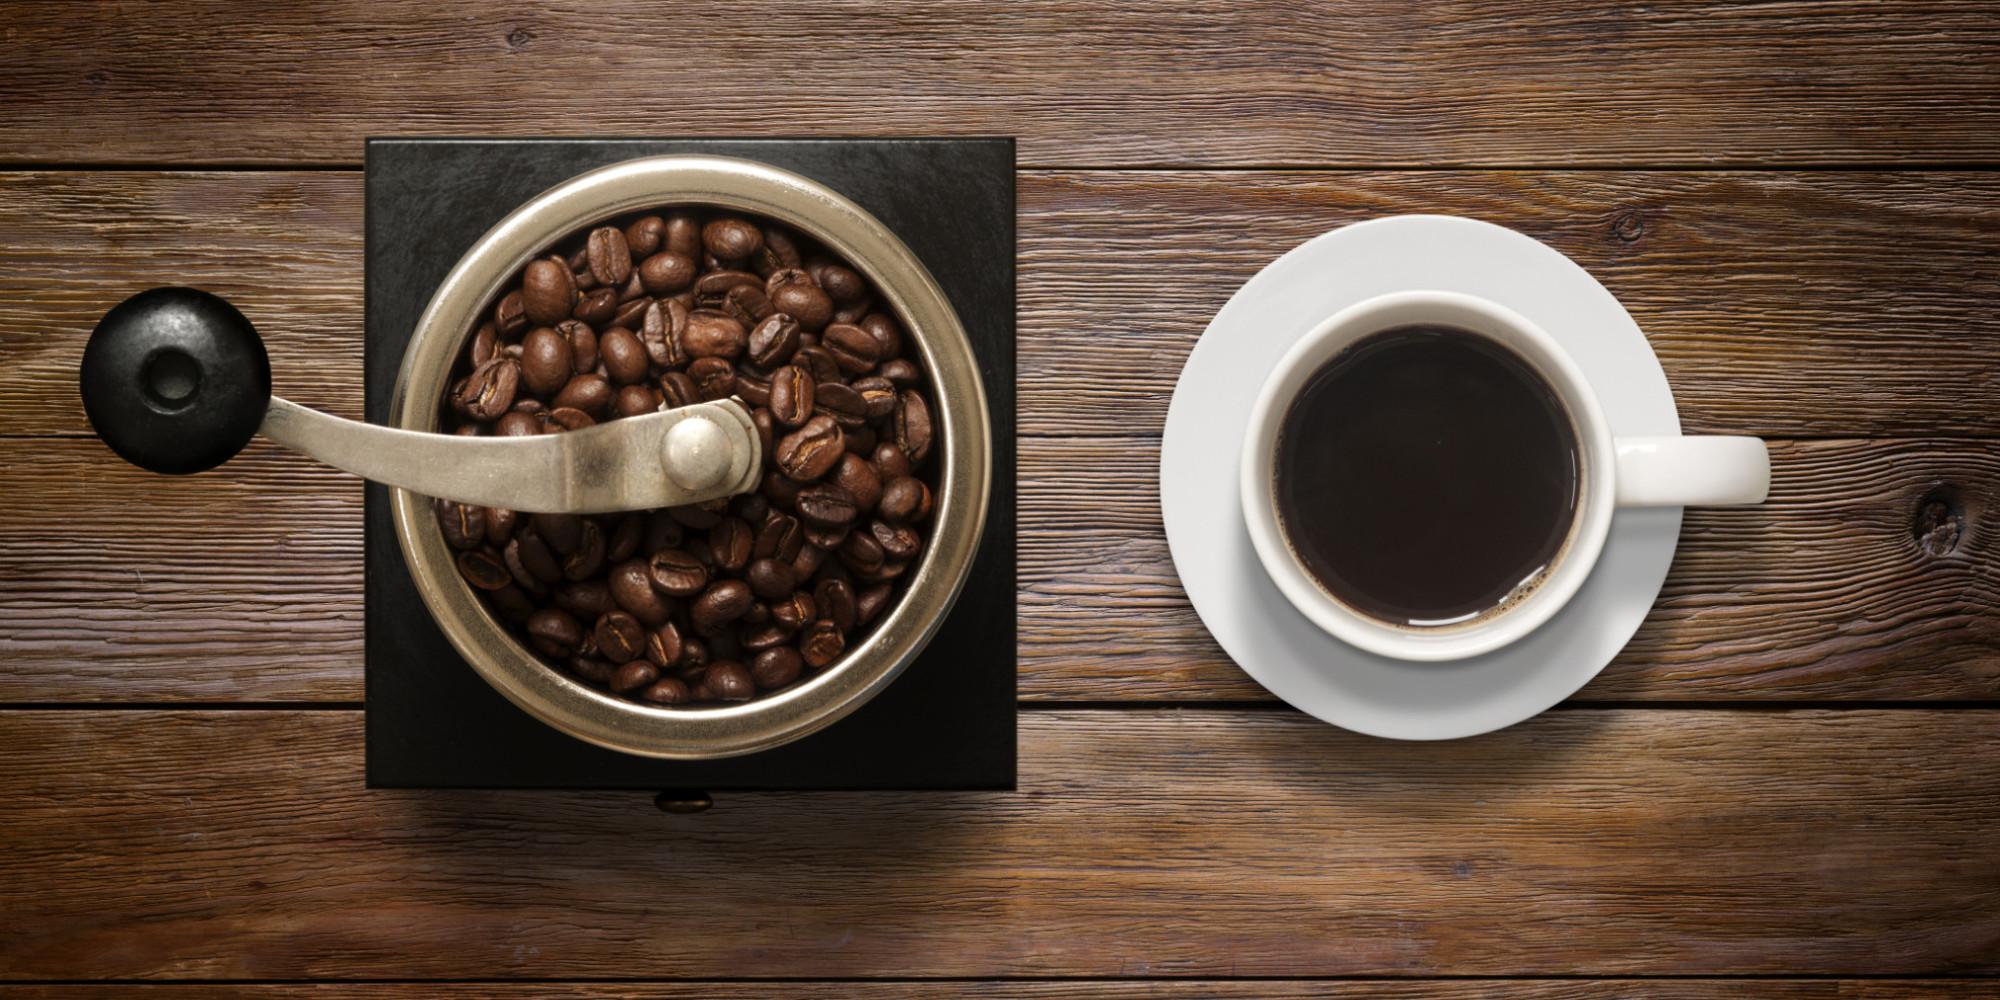 Gta hot coffee scene video chat